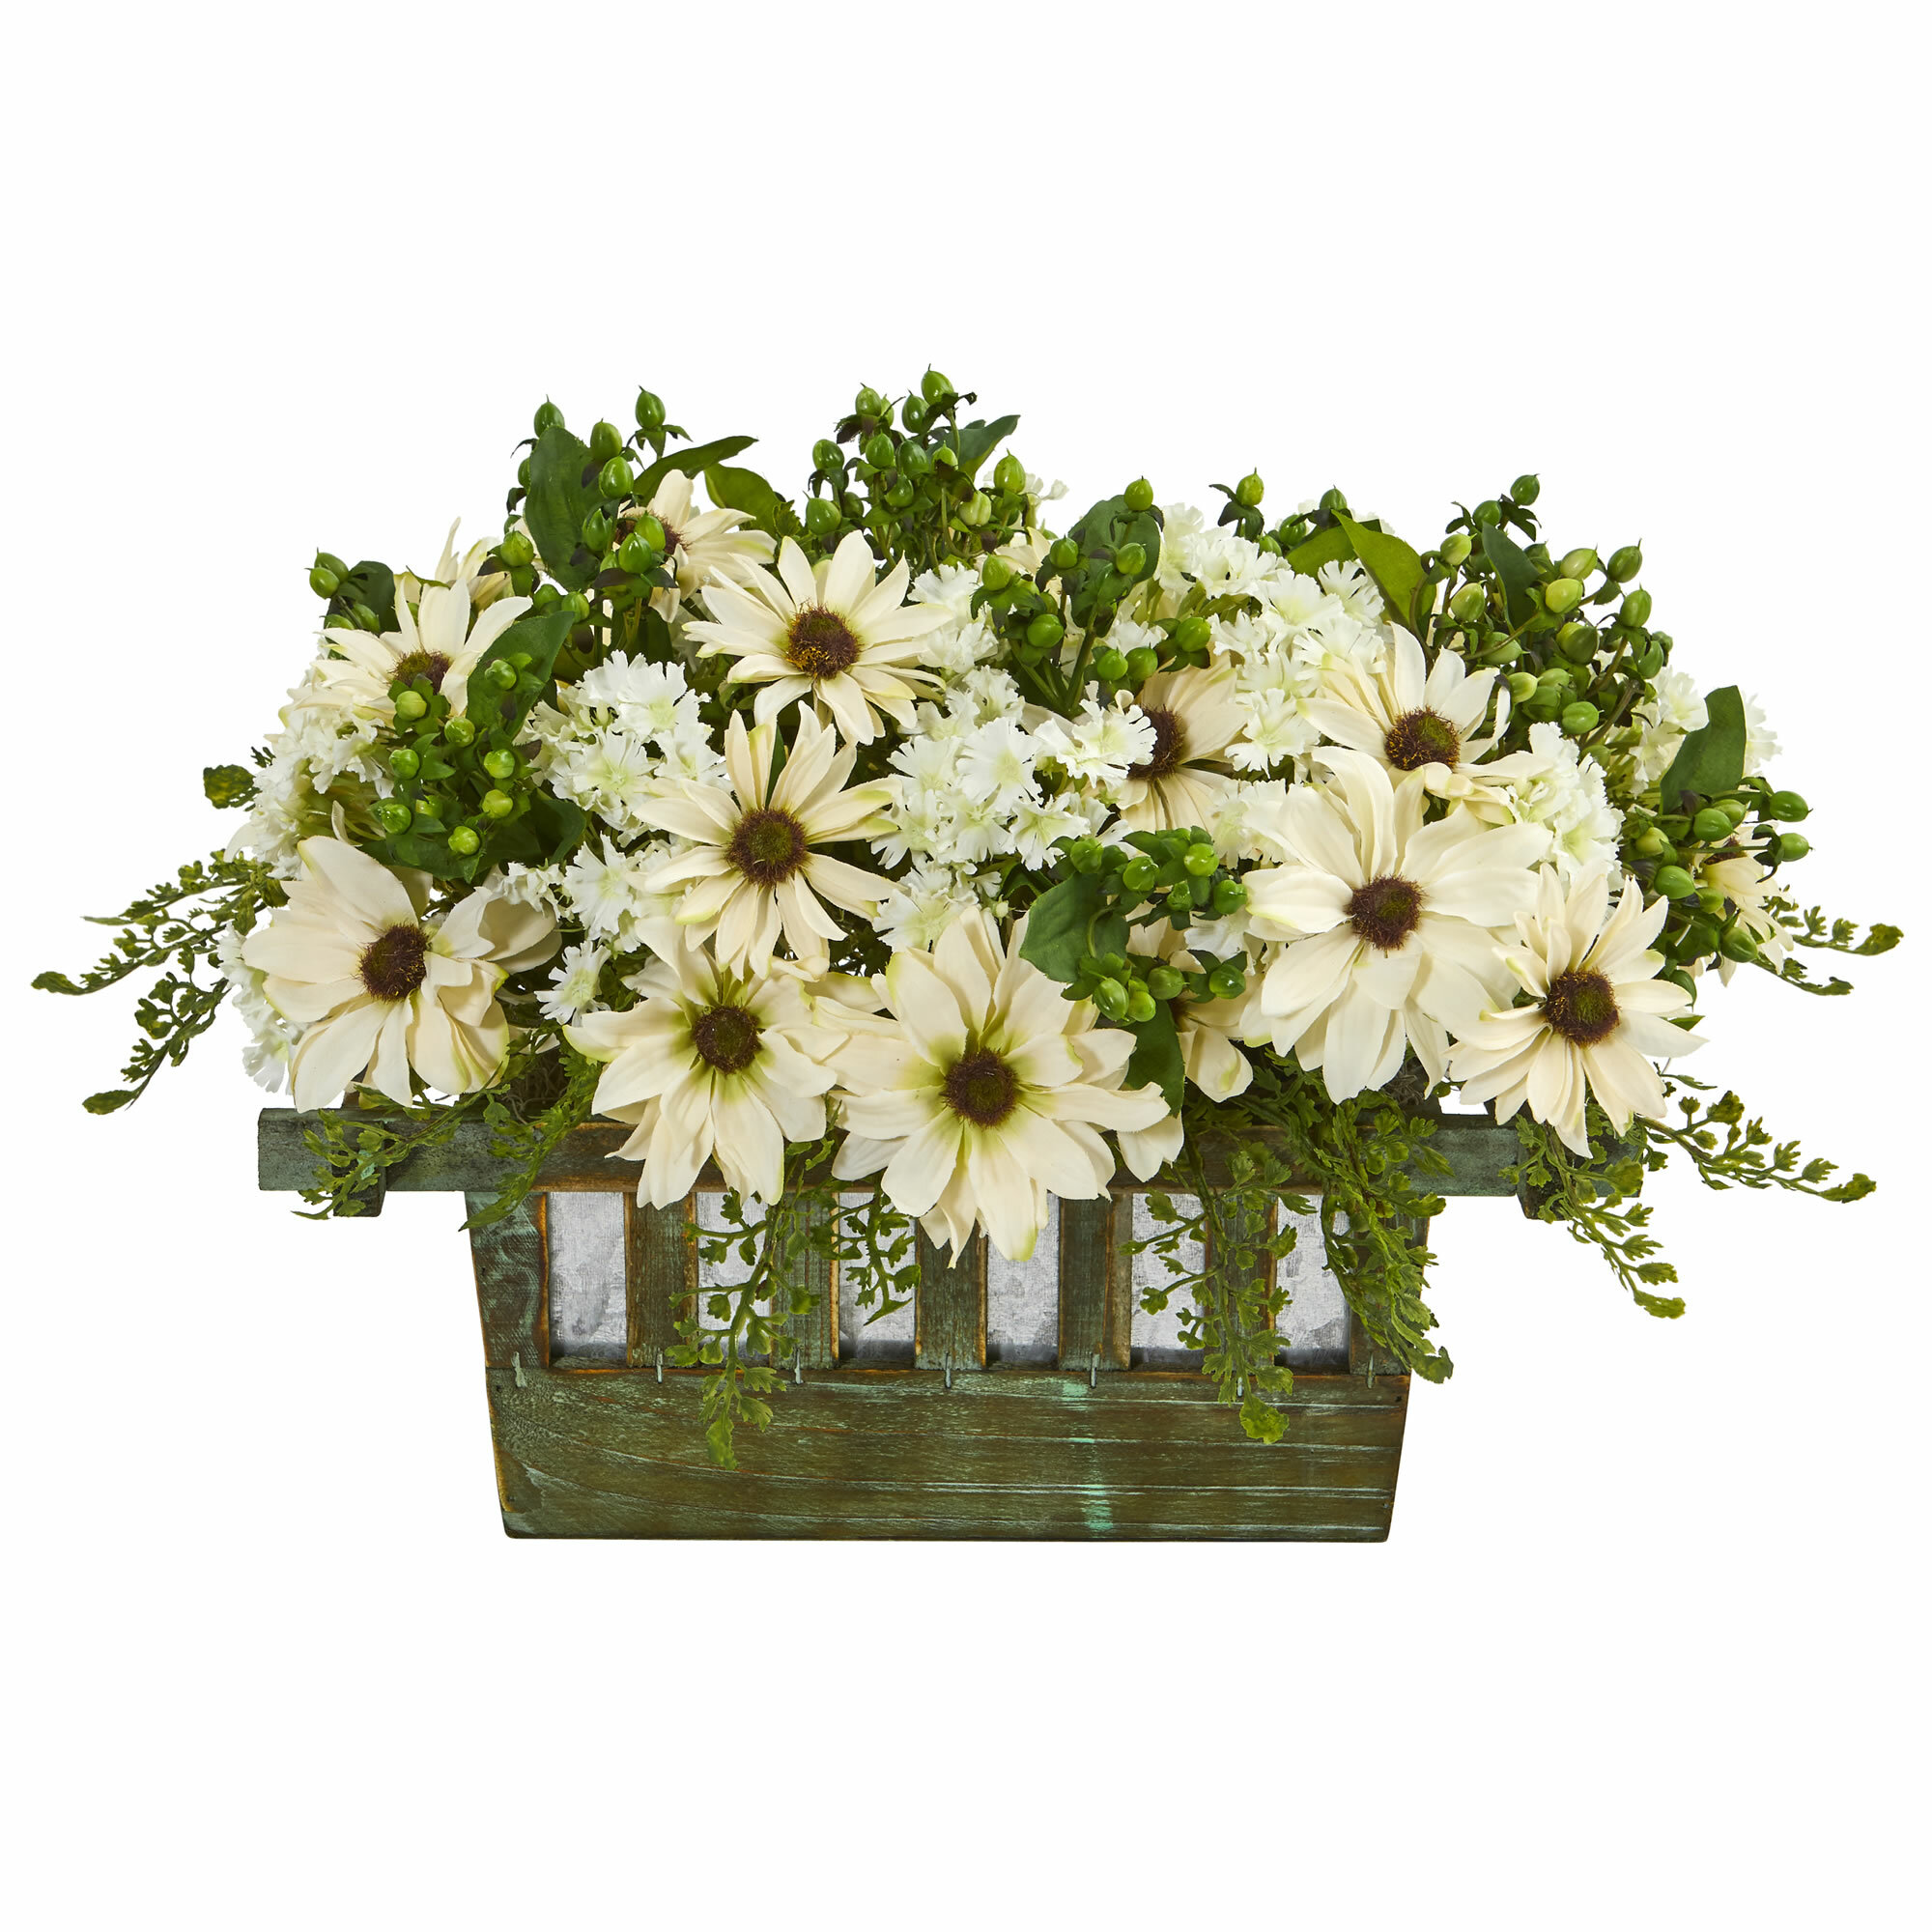 Gracie oaks daisy floral arrangement in decorative planter wayfair izmirmasajfo